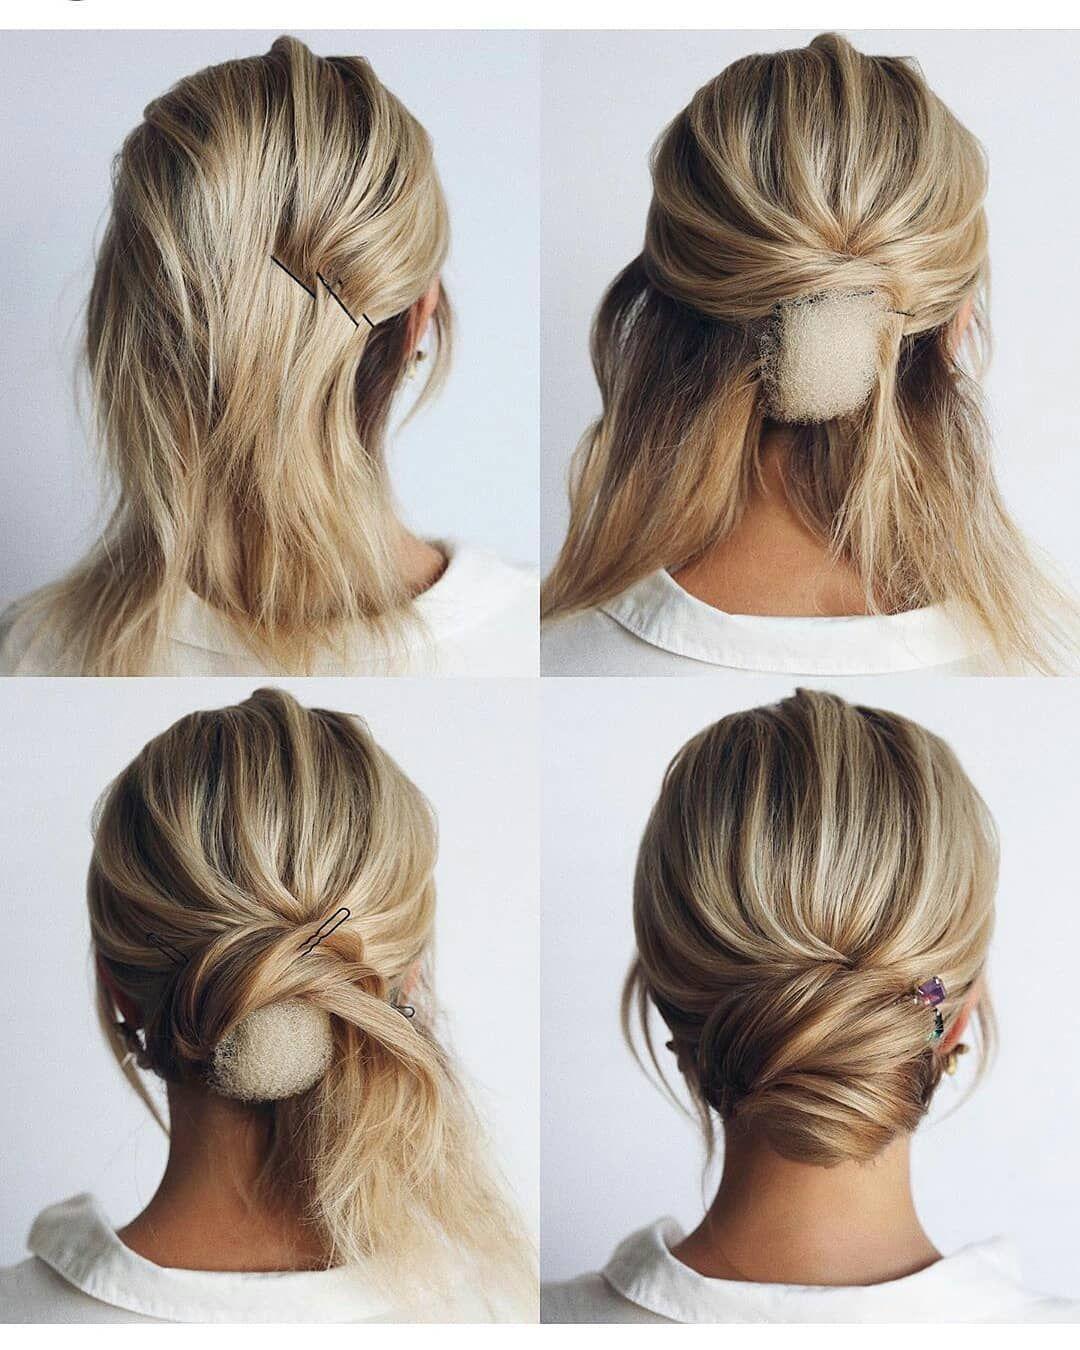 Pin By Katerina Maskova On Hair In 2020 Short Hair Updo Bridal Hair Updo Short Hair Styles